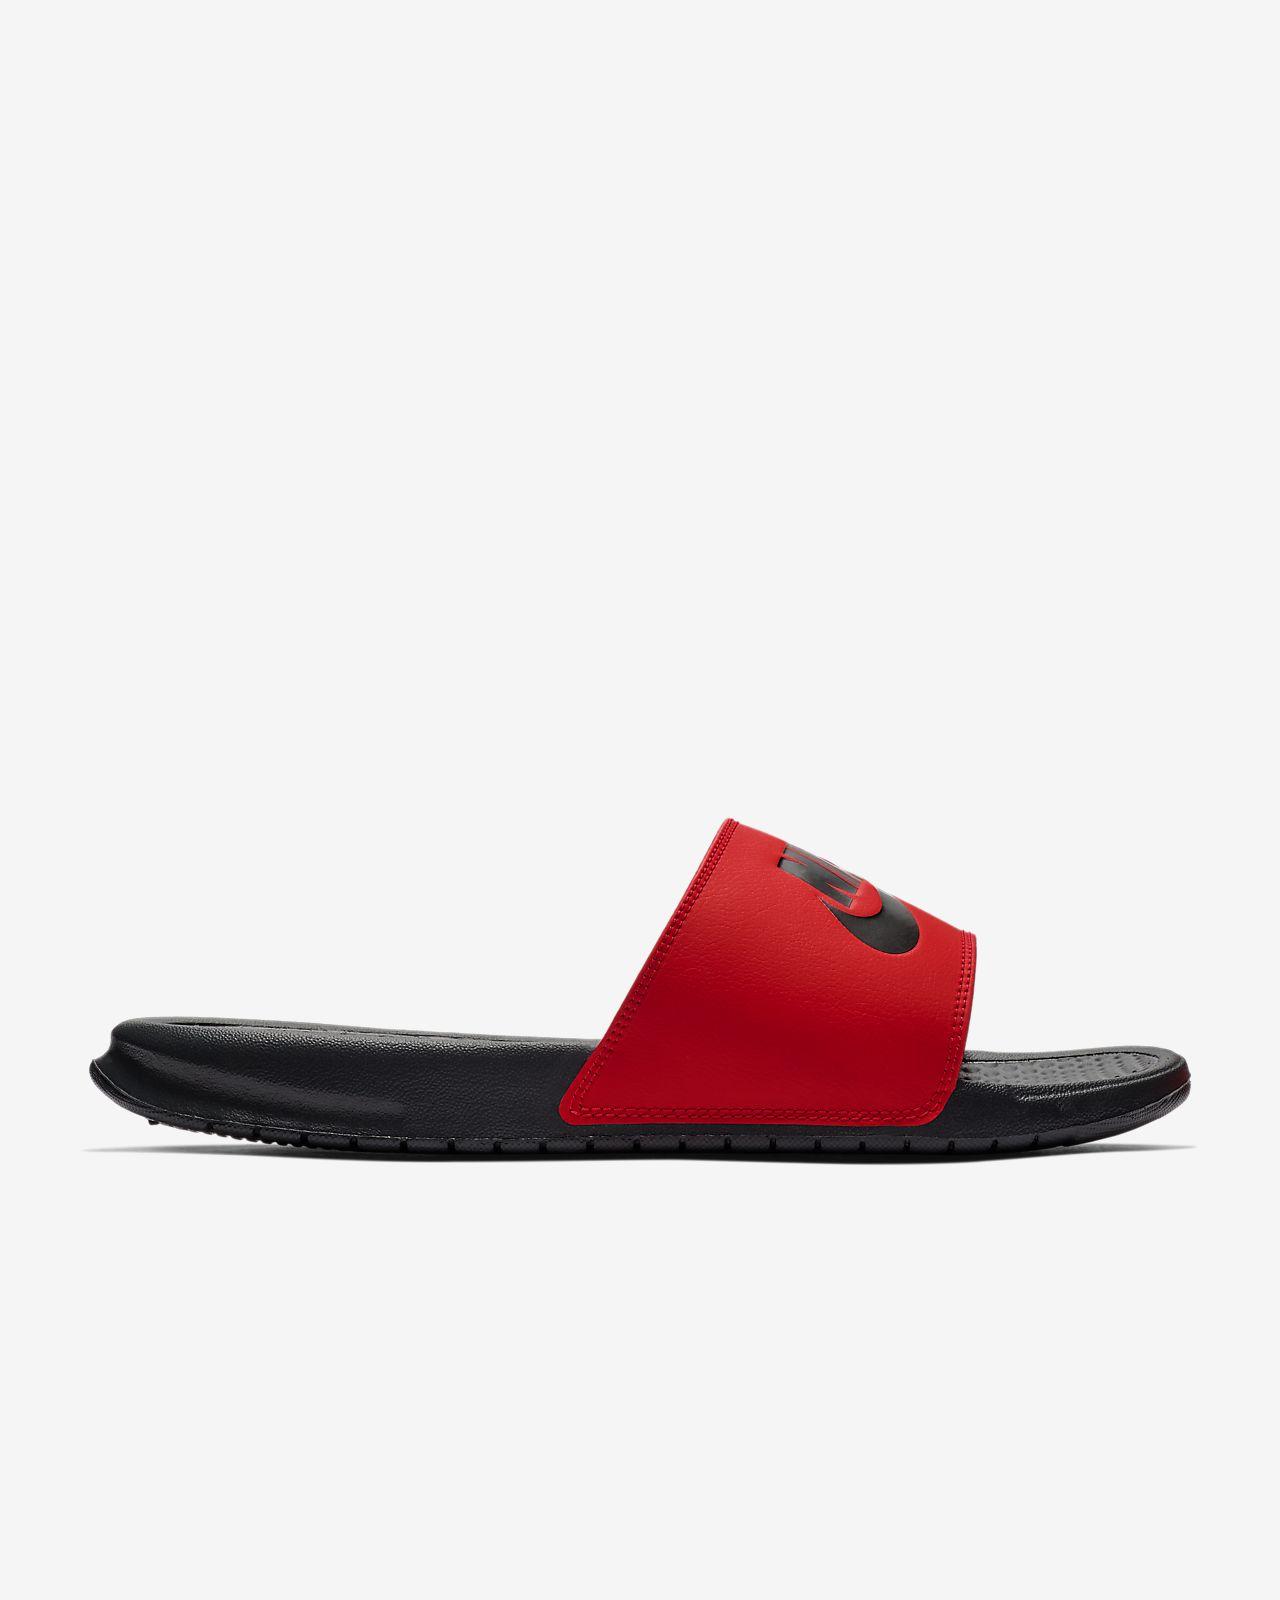 665de3931 Low Resolution Nike Benassi Slide Nike Benassi Slide